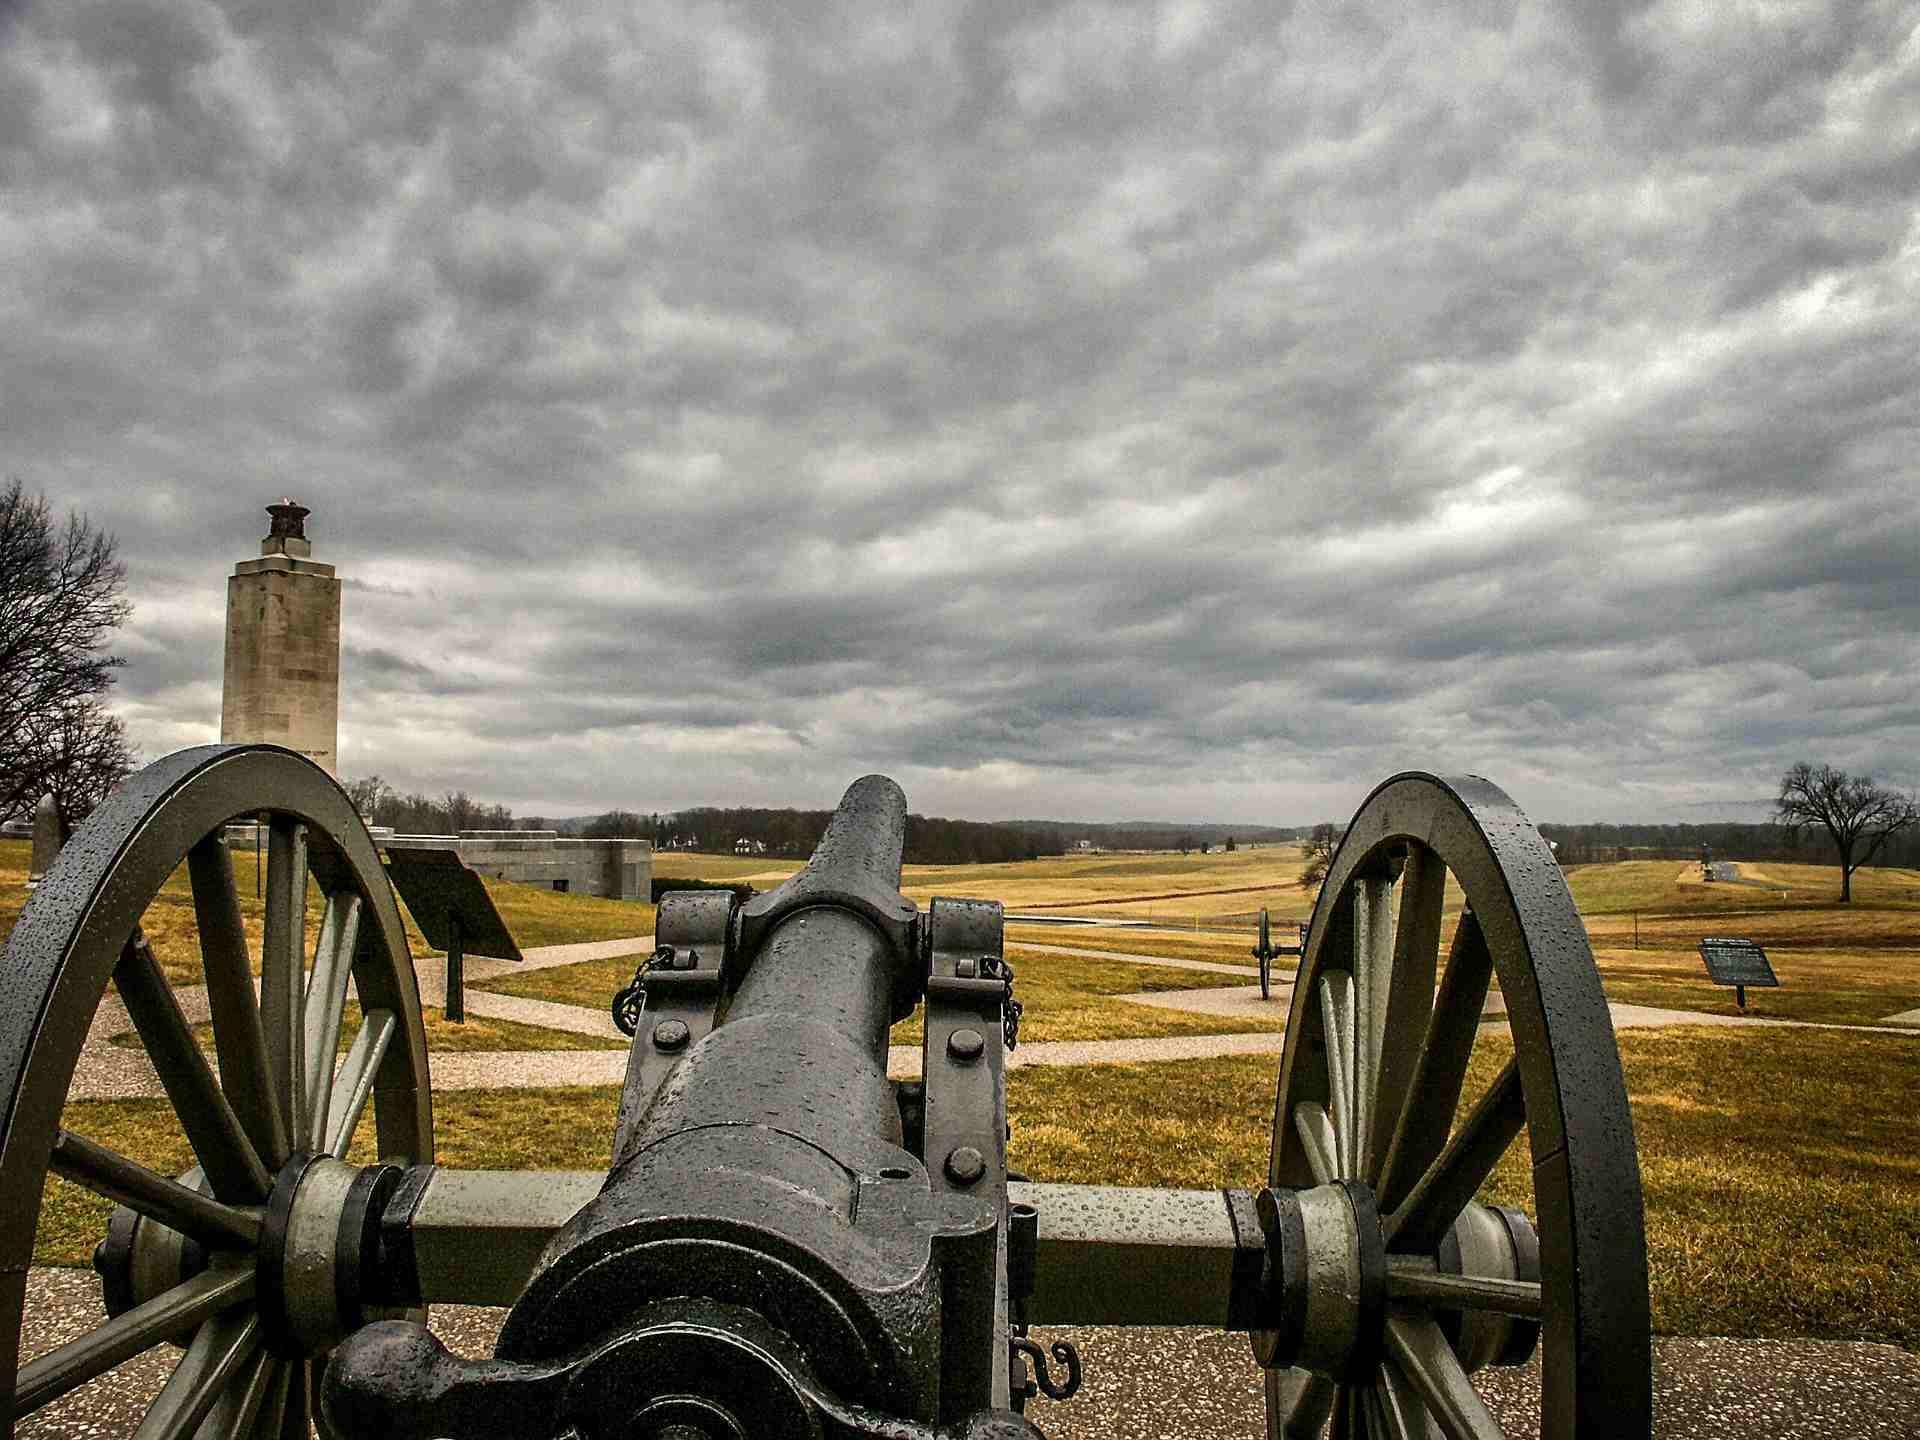 Gettysburg National Battlefield, Pennsylvania